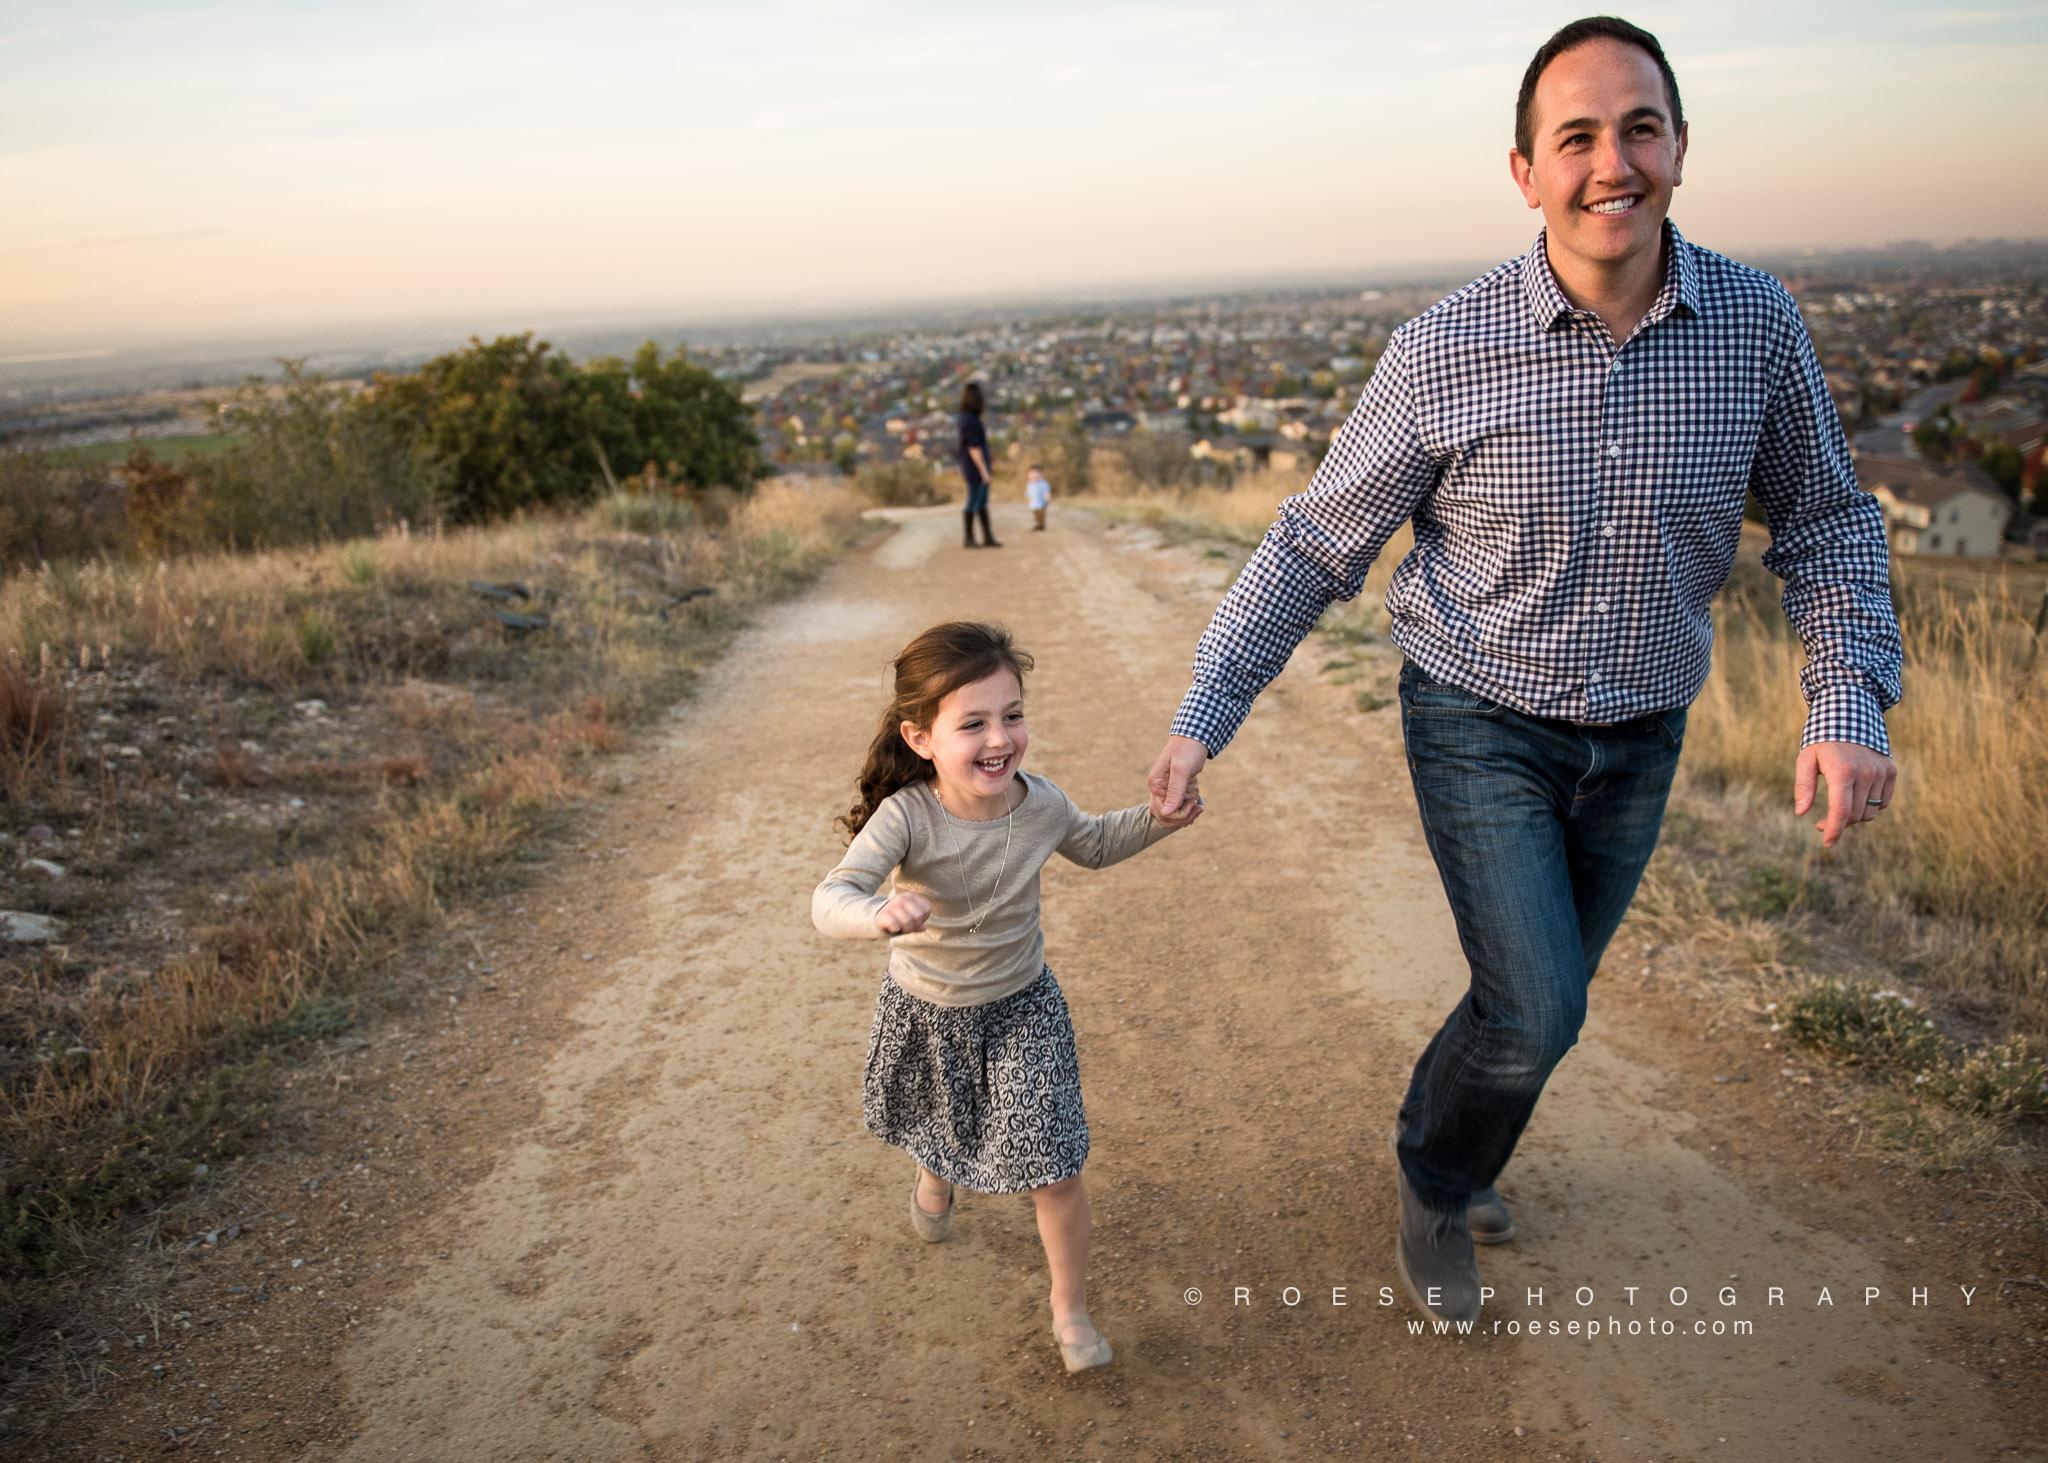 C.-Roese-Ramp-Roese-Photography-LLC.-Bennett-Family-18.jpg